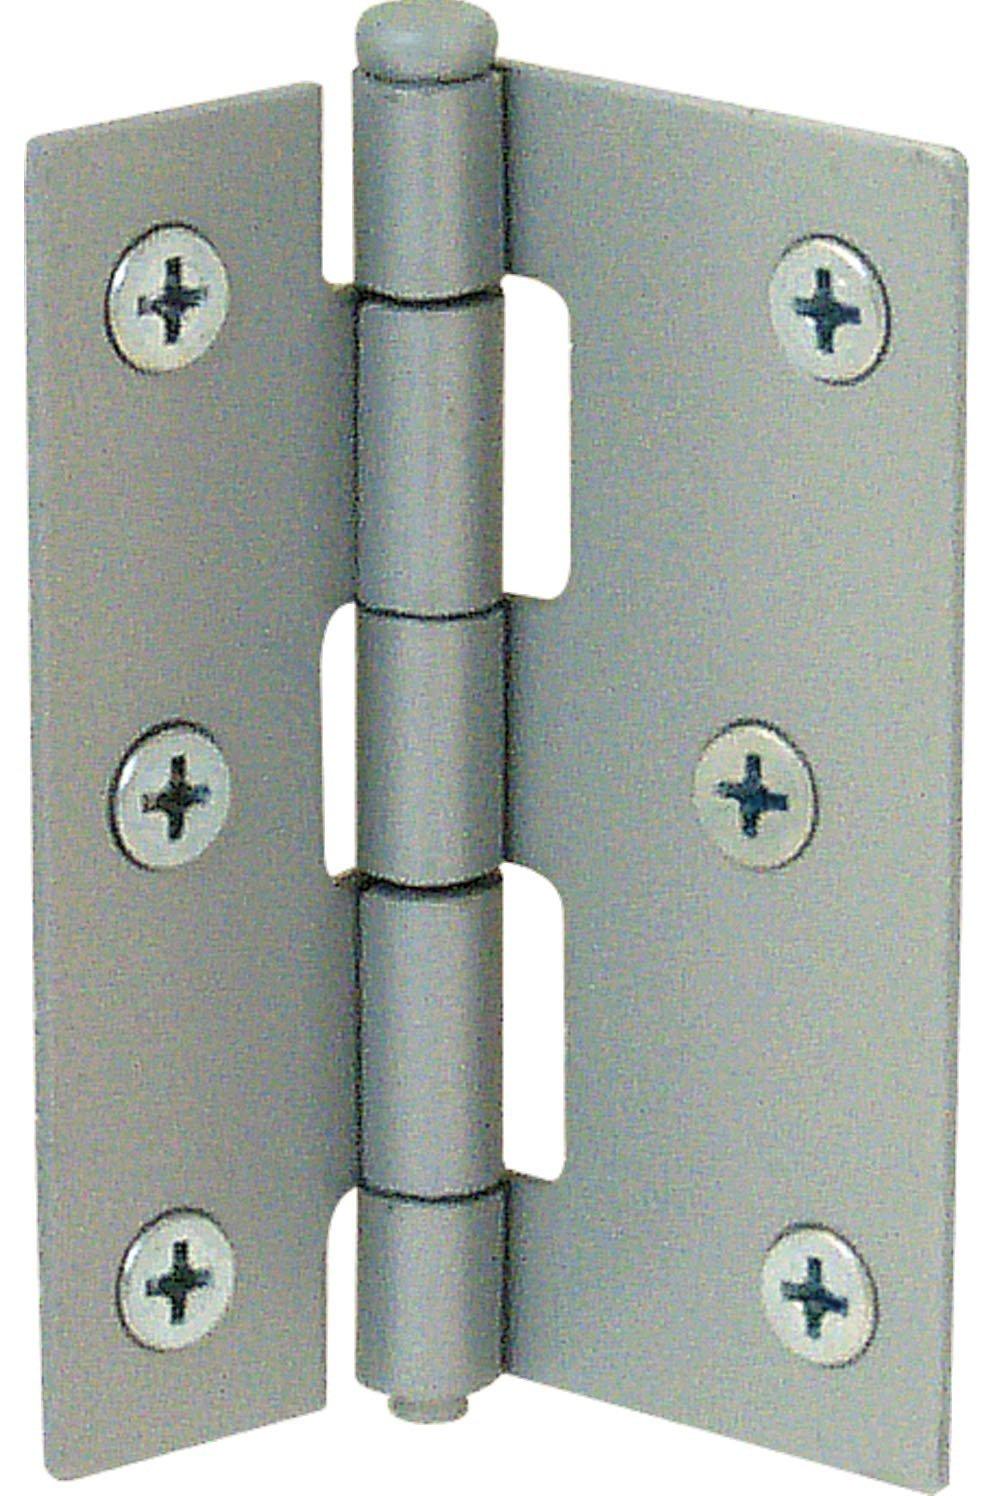 Prime-Line Products K 5038 Screen Door Hinge Steel, Grey,(Pack of 2)